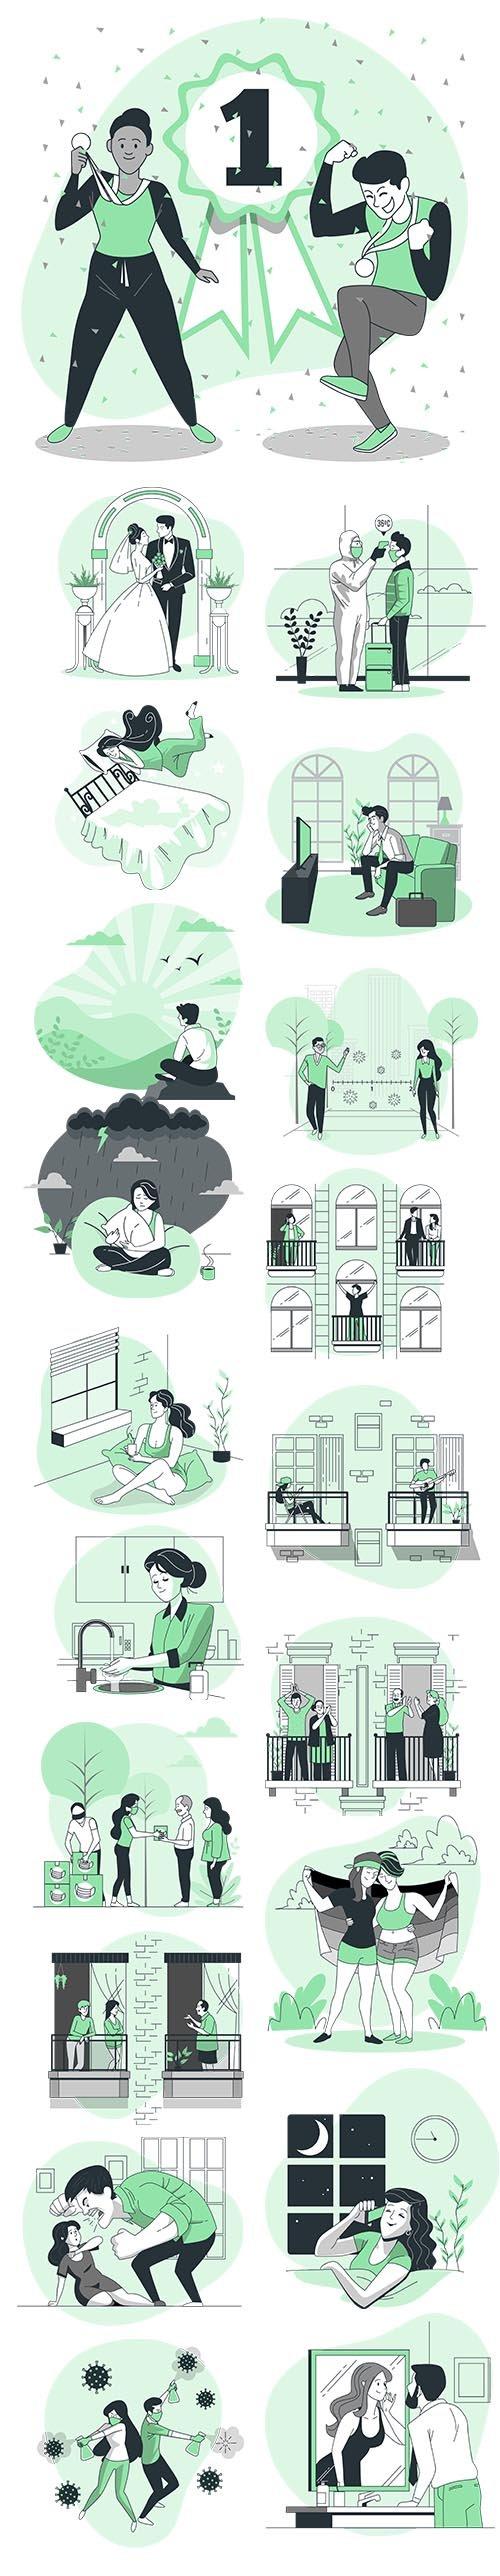 Vector Green Illustrations People Concept Vol 2